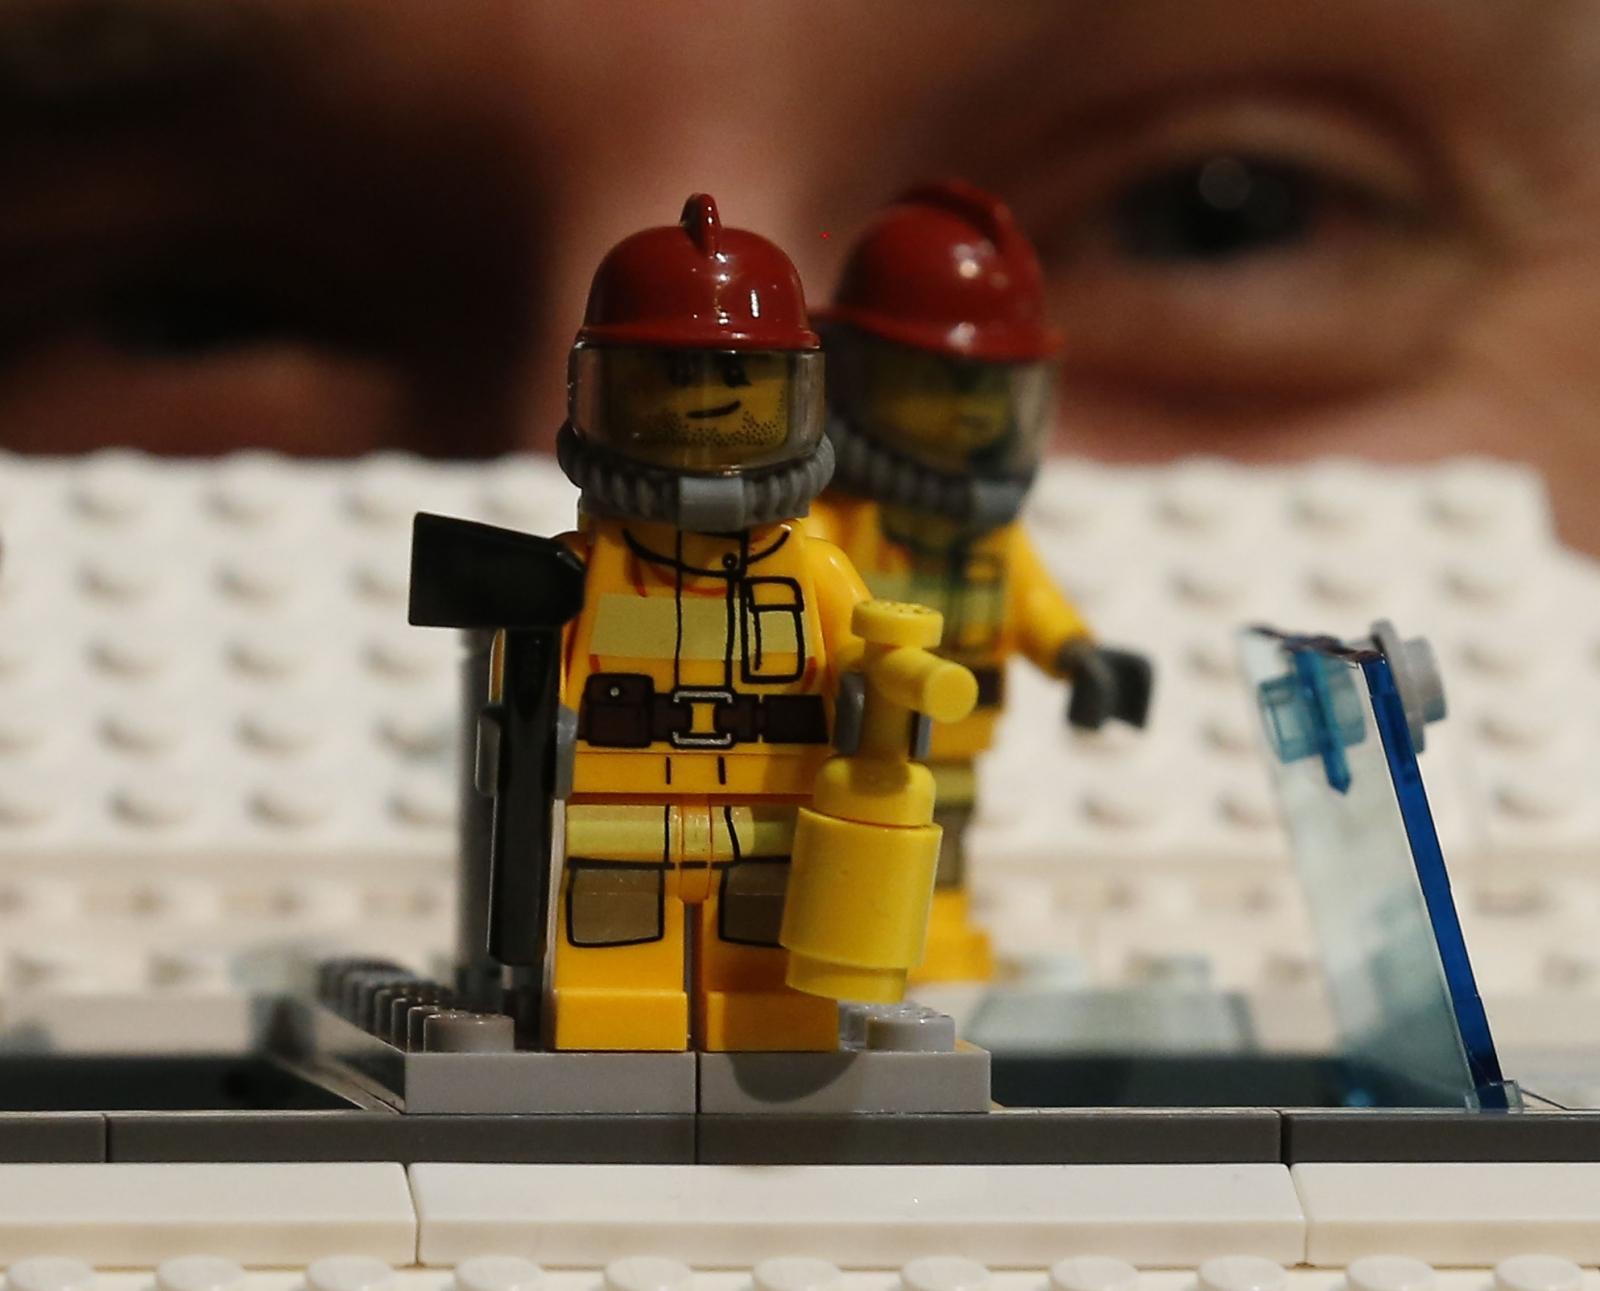 Lego eye tribe tracking